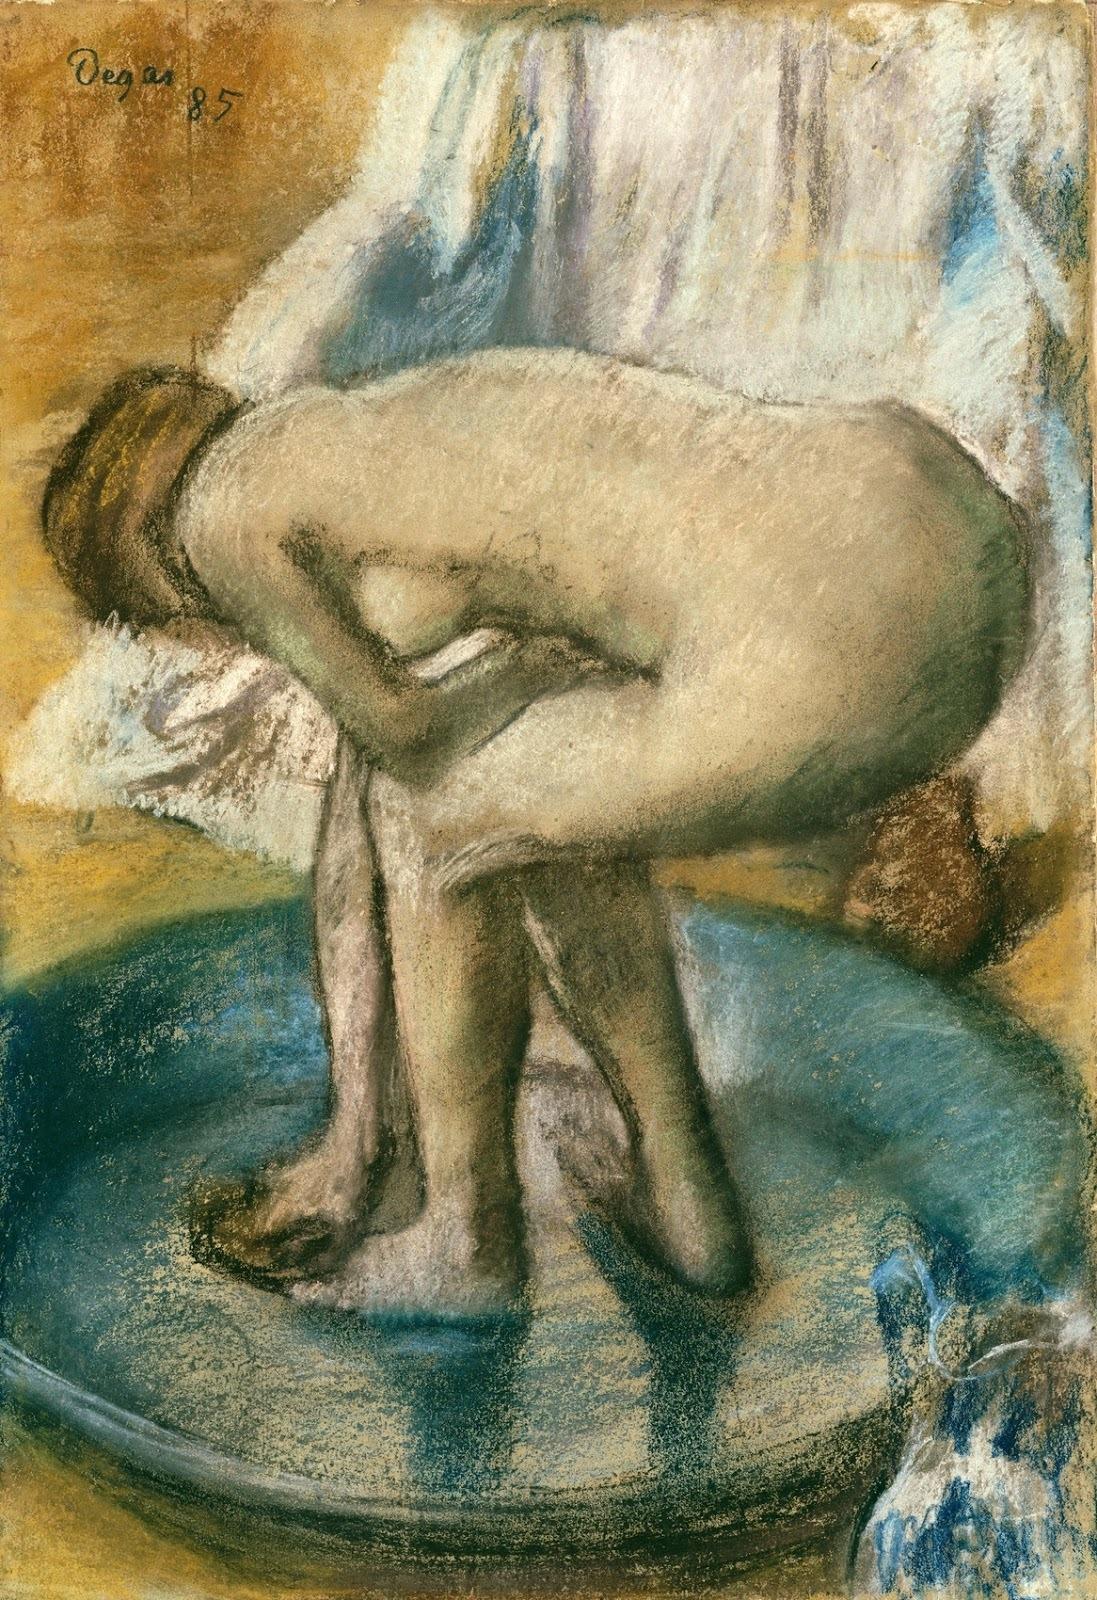 Эдгар Дега. 1885. Женщина, купающаяся в тазу (Woman Bathing in a Shallow Tub). 81.3 х 56.2. Бумага, смешанная техника. Нью-Йорк, Метрополитен.